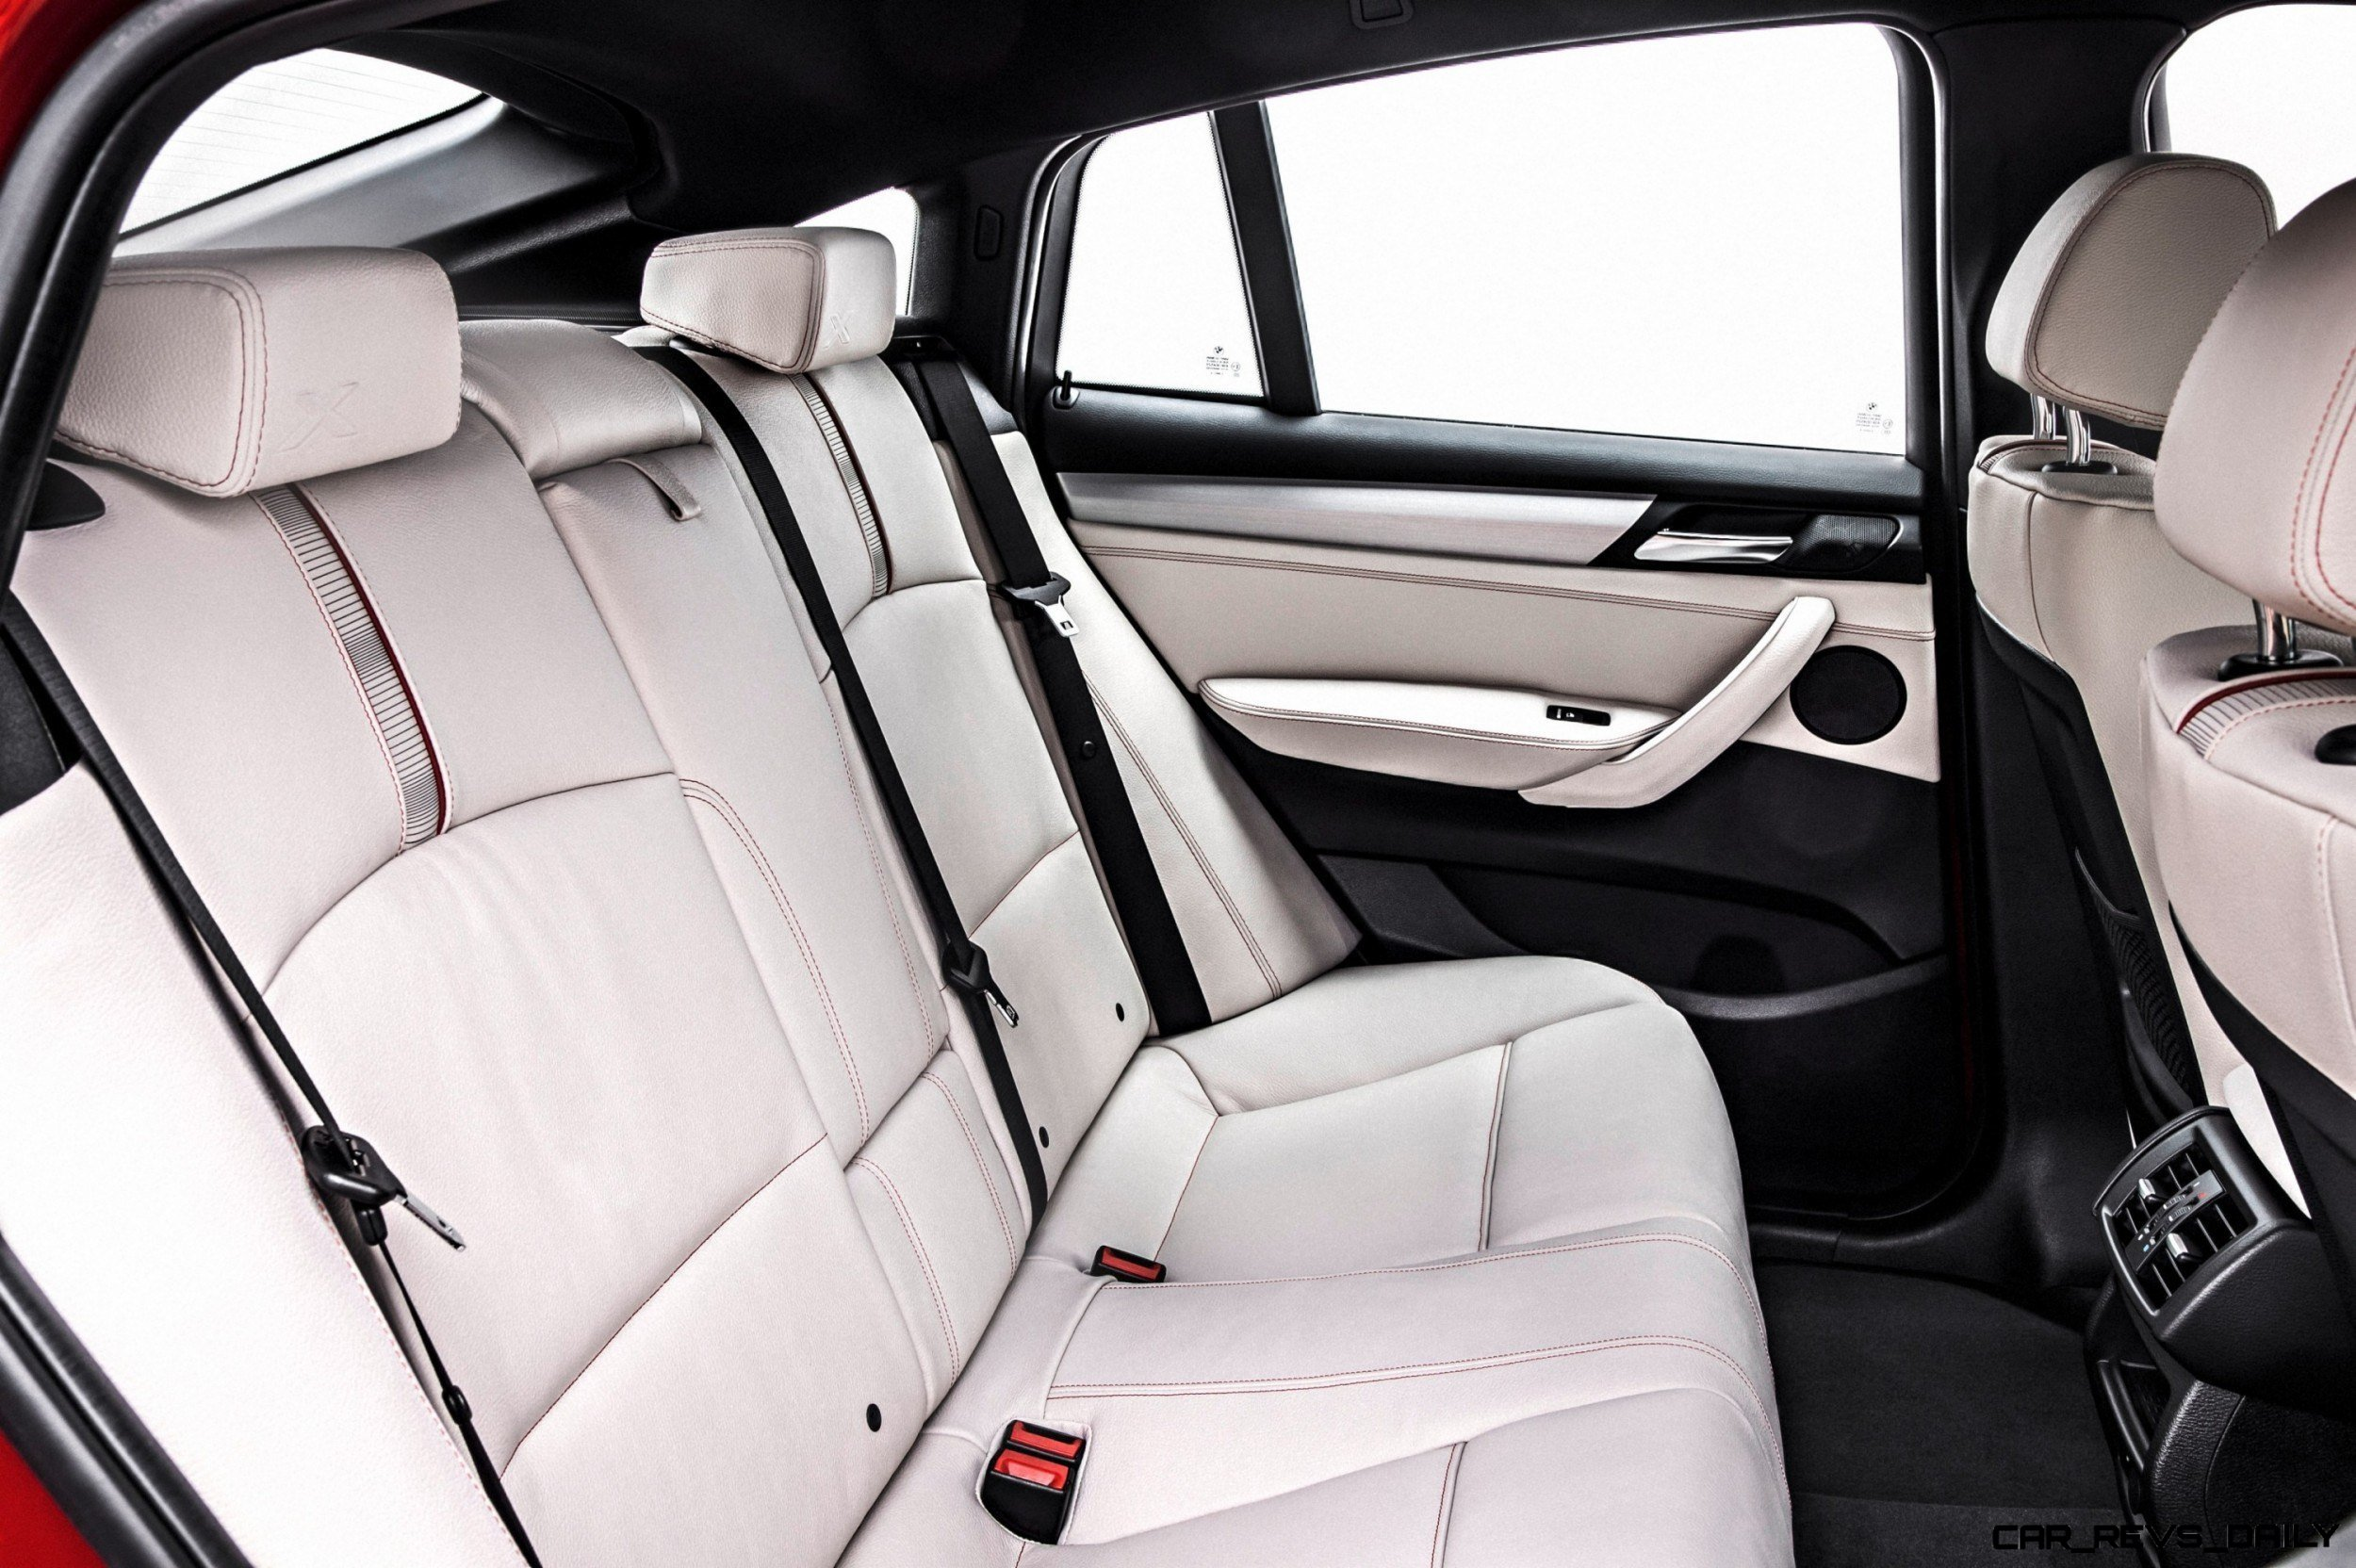 2015 BMW X4 Interior 1